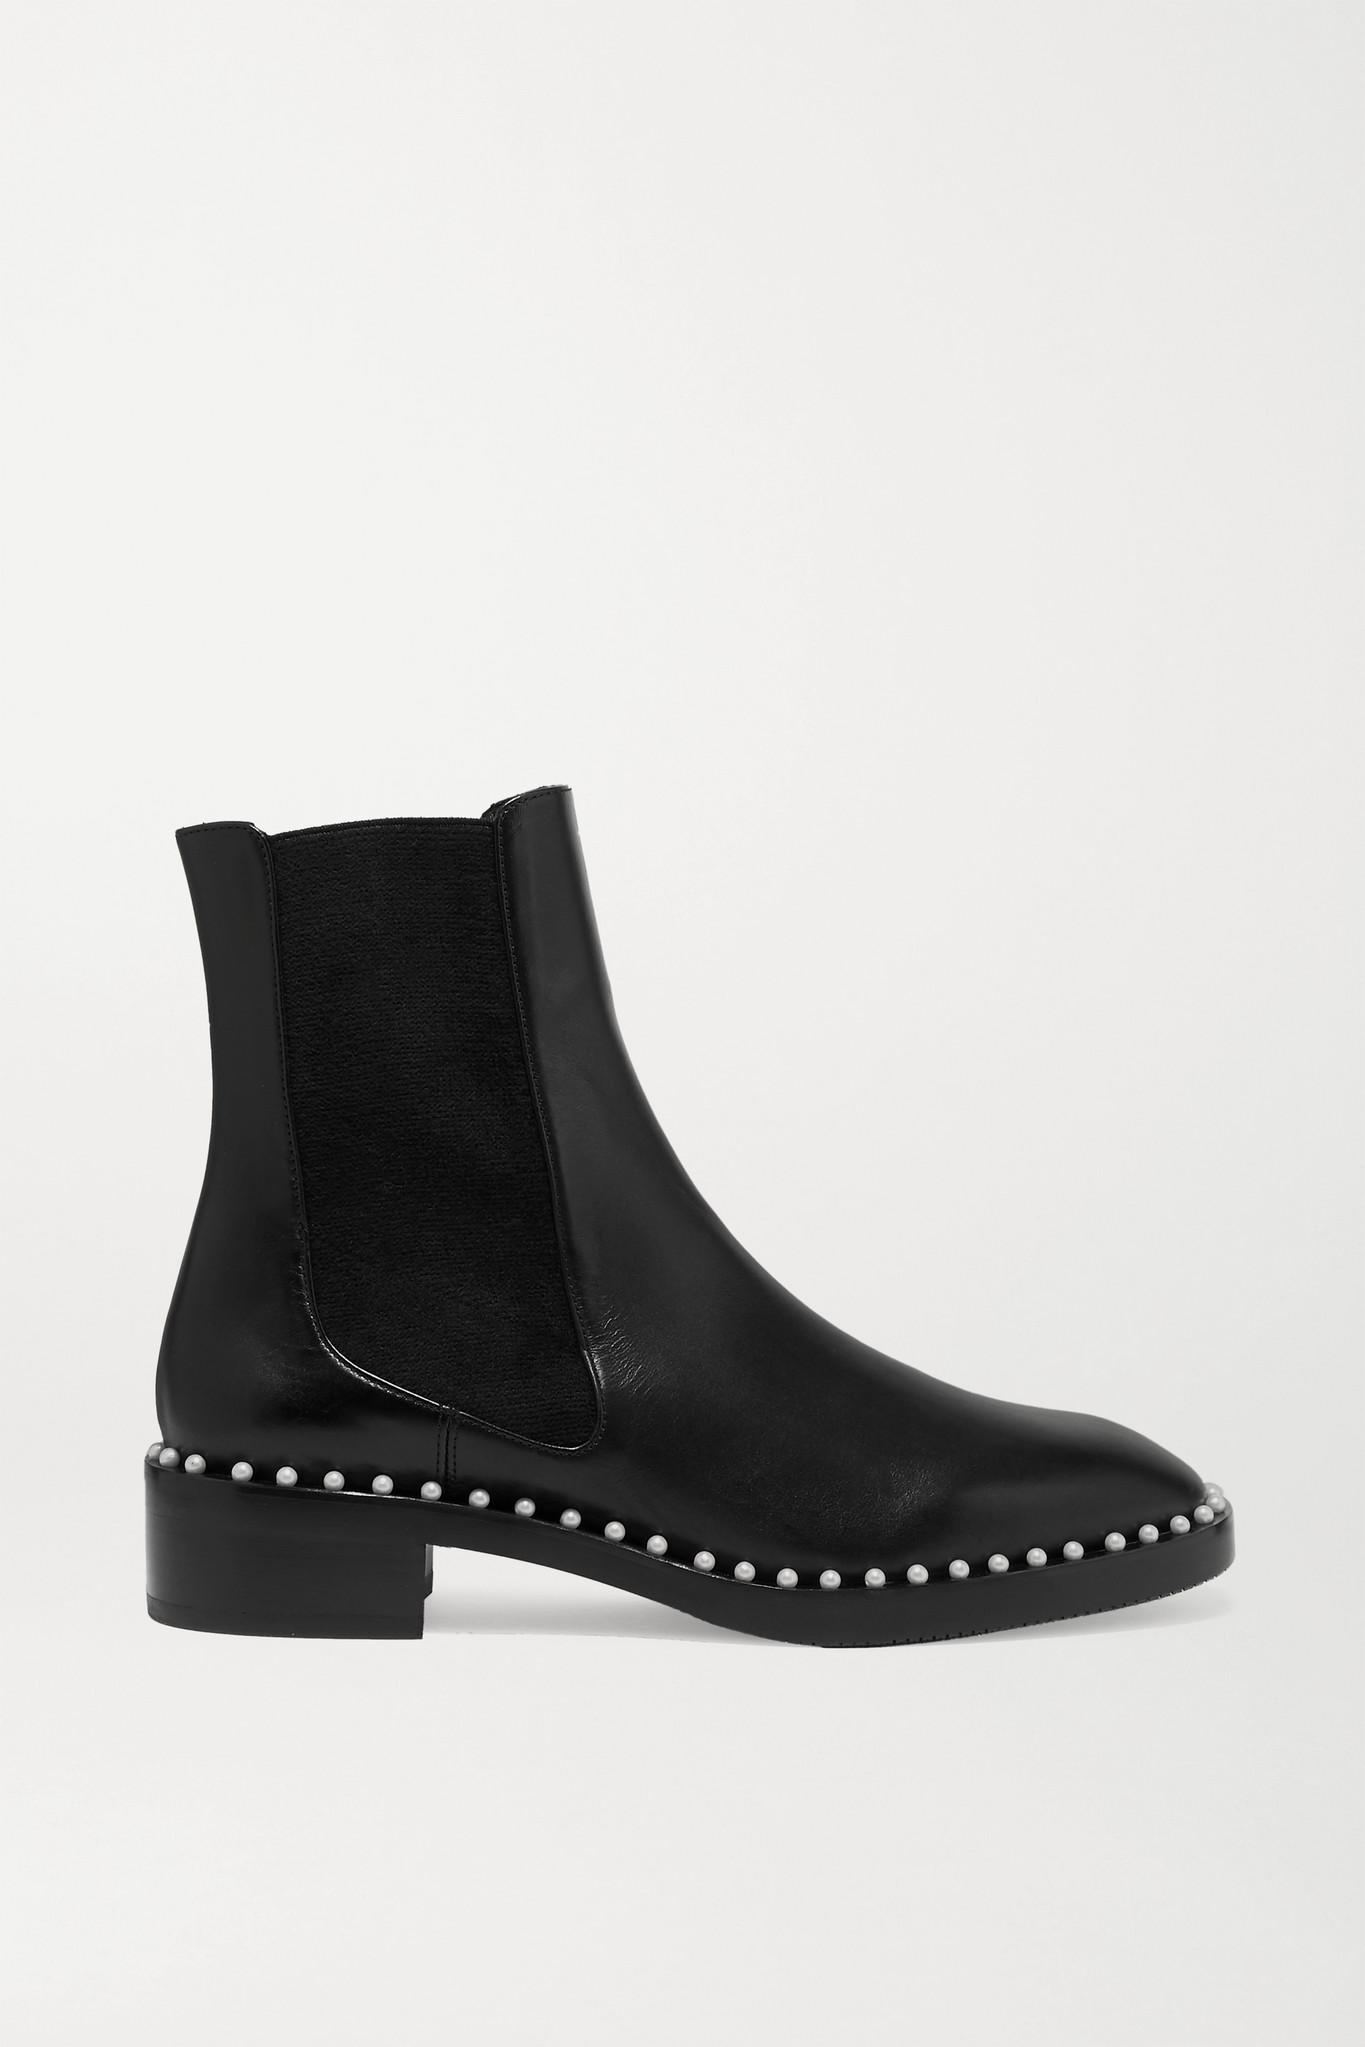 STUART WEITZMAN - Cline 人造珍珠缀饰皮革切尔西靴 - 黑色 - IT35.5